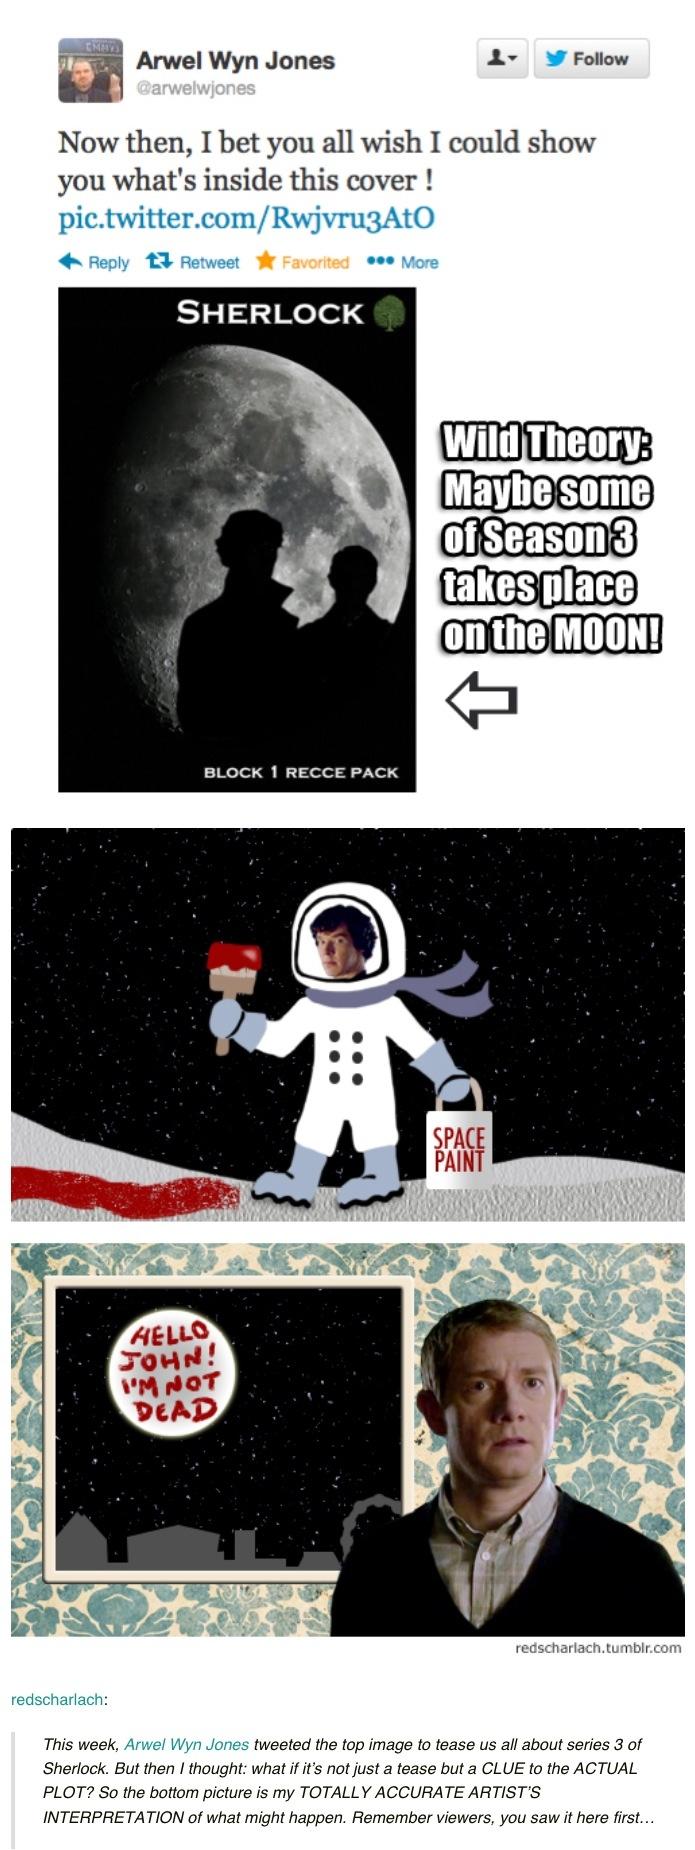 12 mejores imágenes de Miscellaneous en Pinterest | Cosas divertidas ...